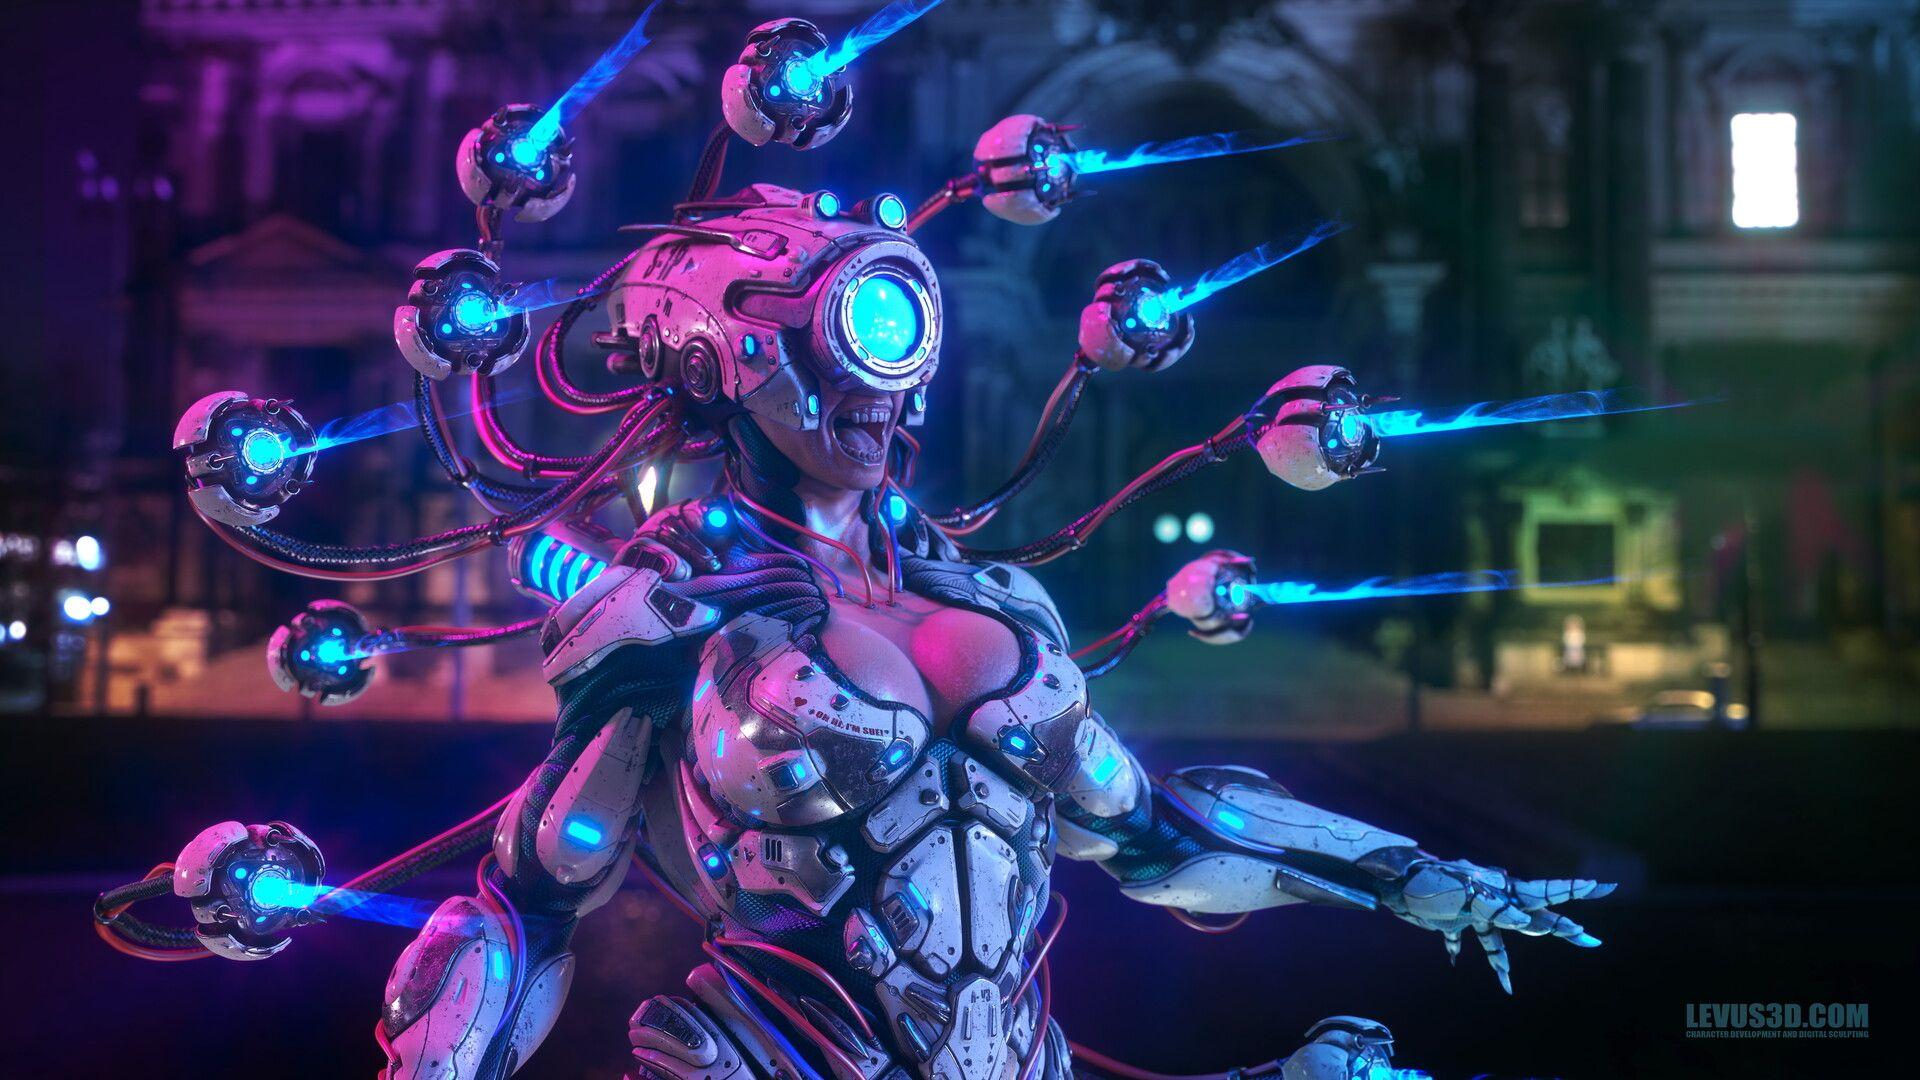 All Seeing Sue by Pawel Jaruga Robots concept, Cyberpunk